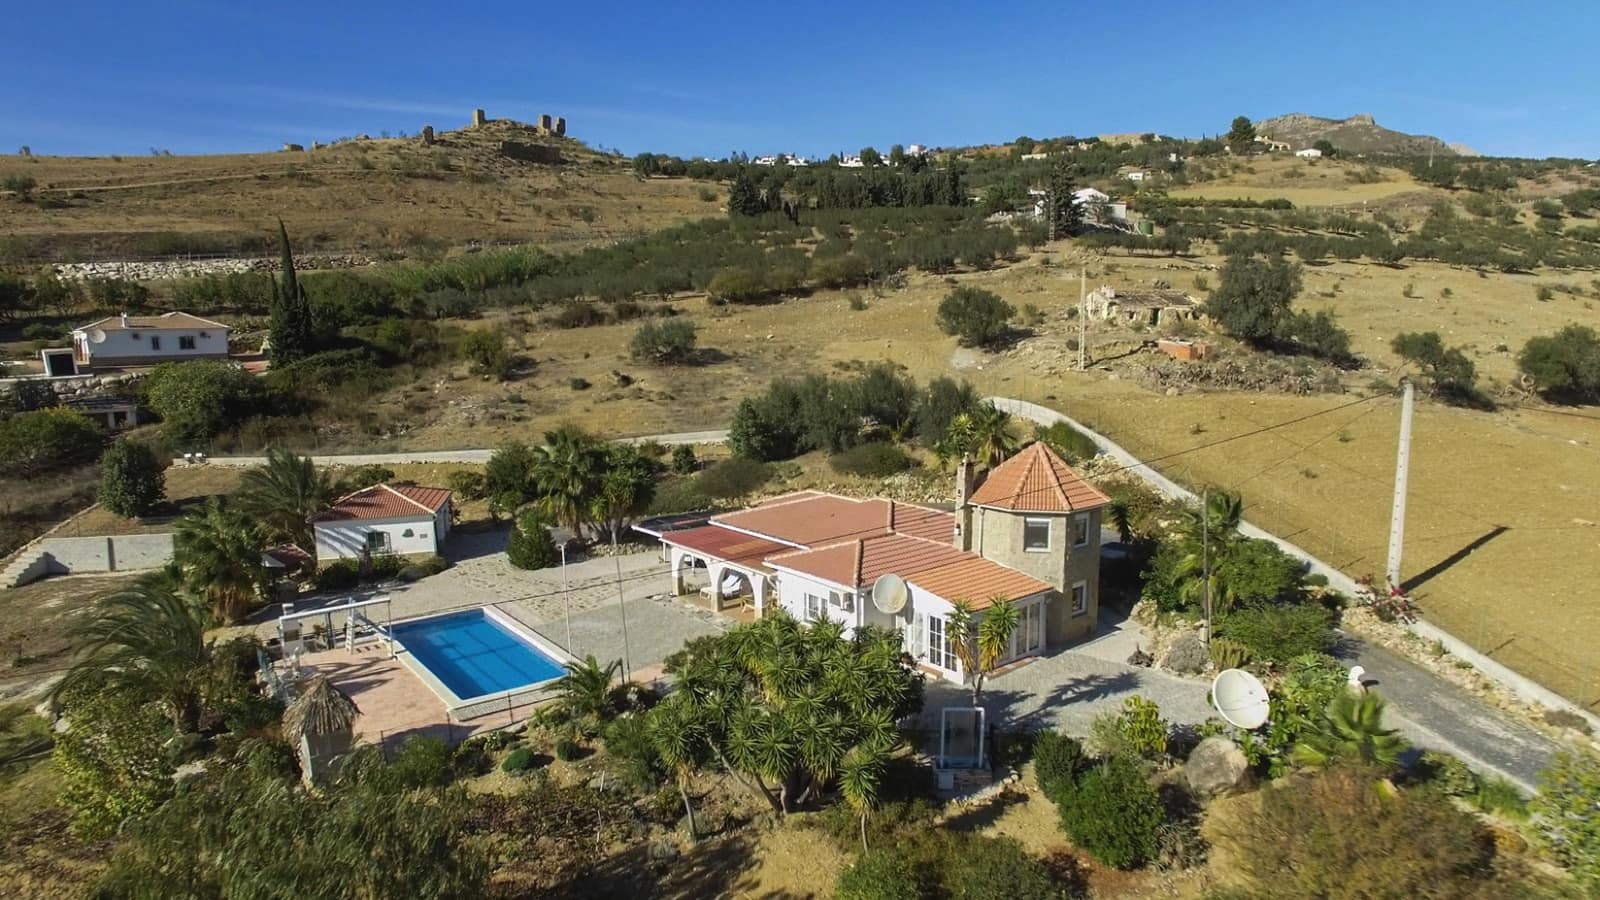 4 bedroom Villa for sale in Alcaucin with pool - € 365,000 (Ref: 4971470)